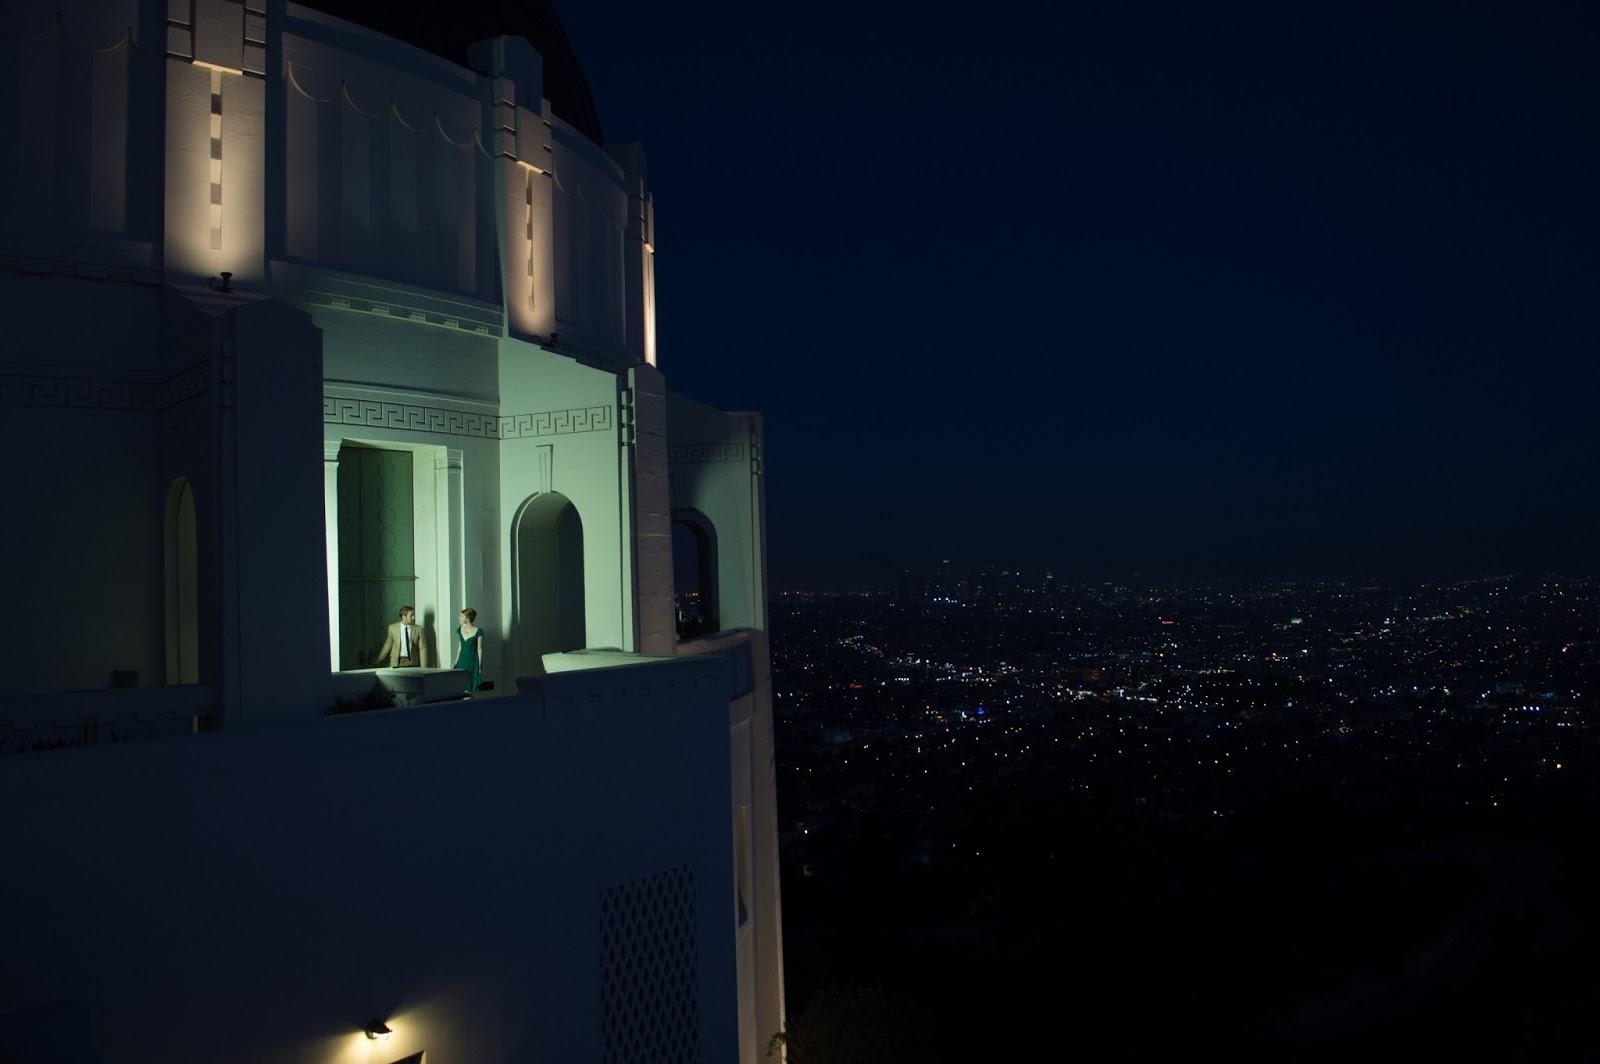 Observatorio , planetario en  LaLaLand